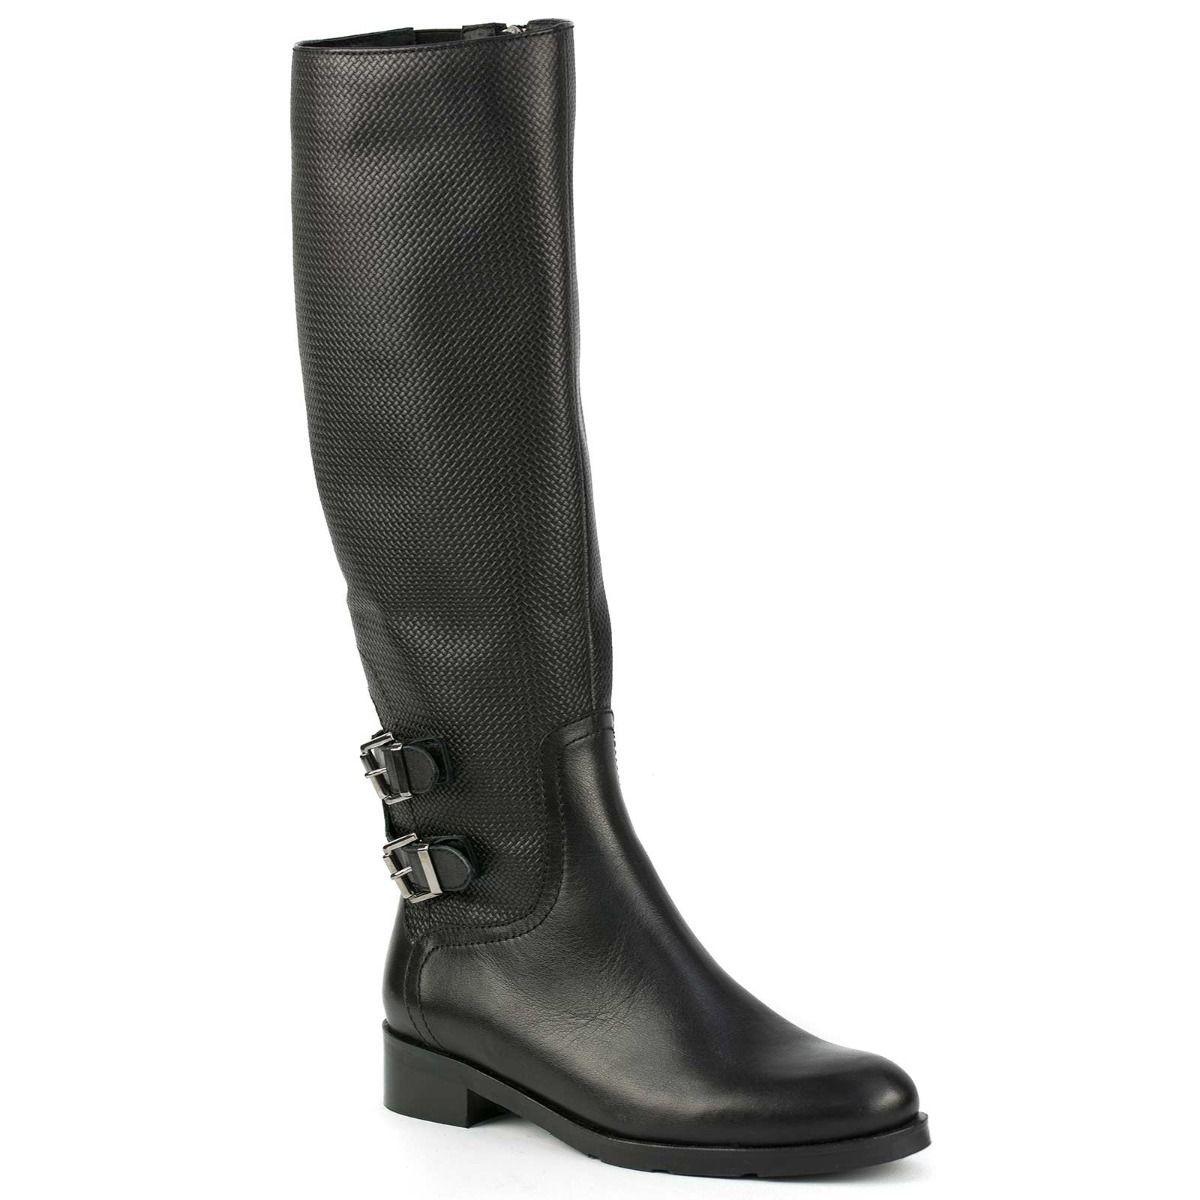 6d957442345 Μαύρη δερμάτινη μπότα ιππασίας με αγκράφες BR27-L14 < Δερμάτινες Μπότες |  MIGATO